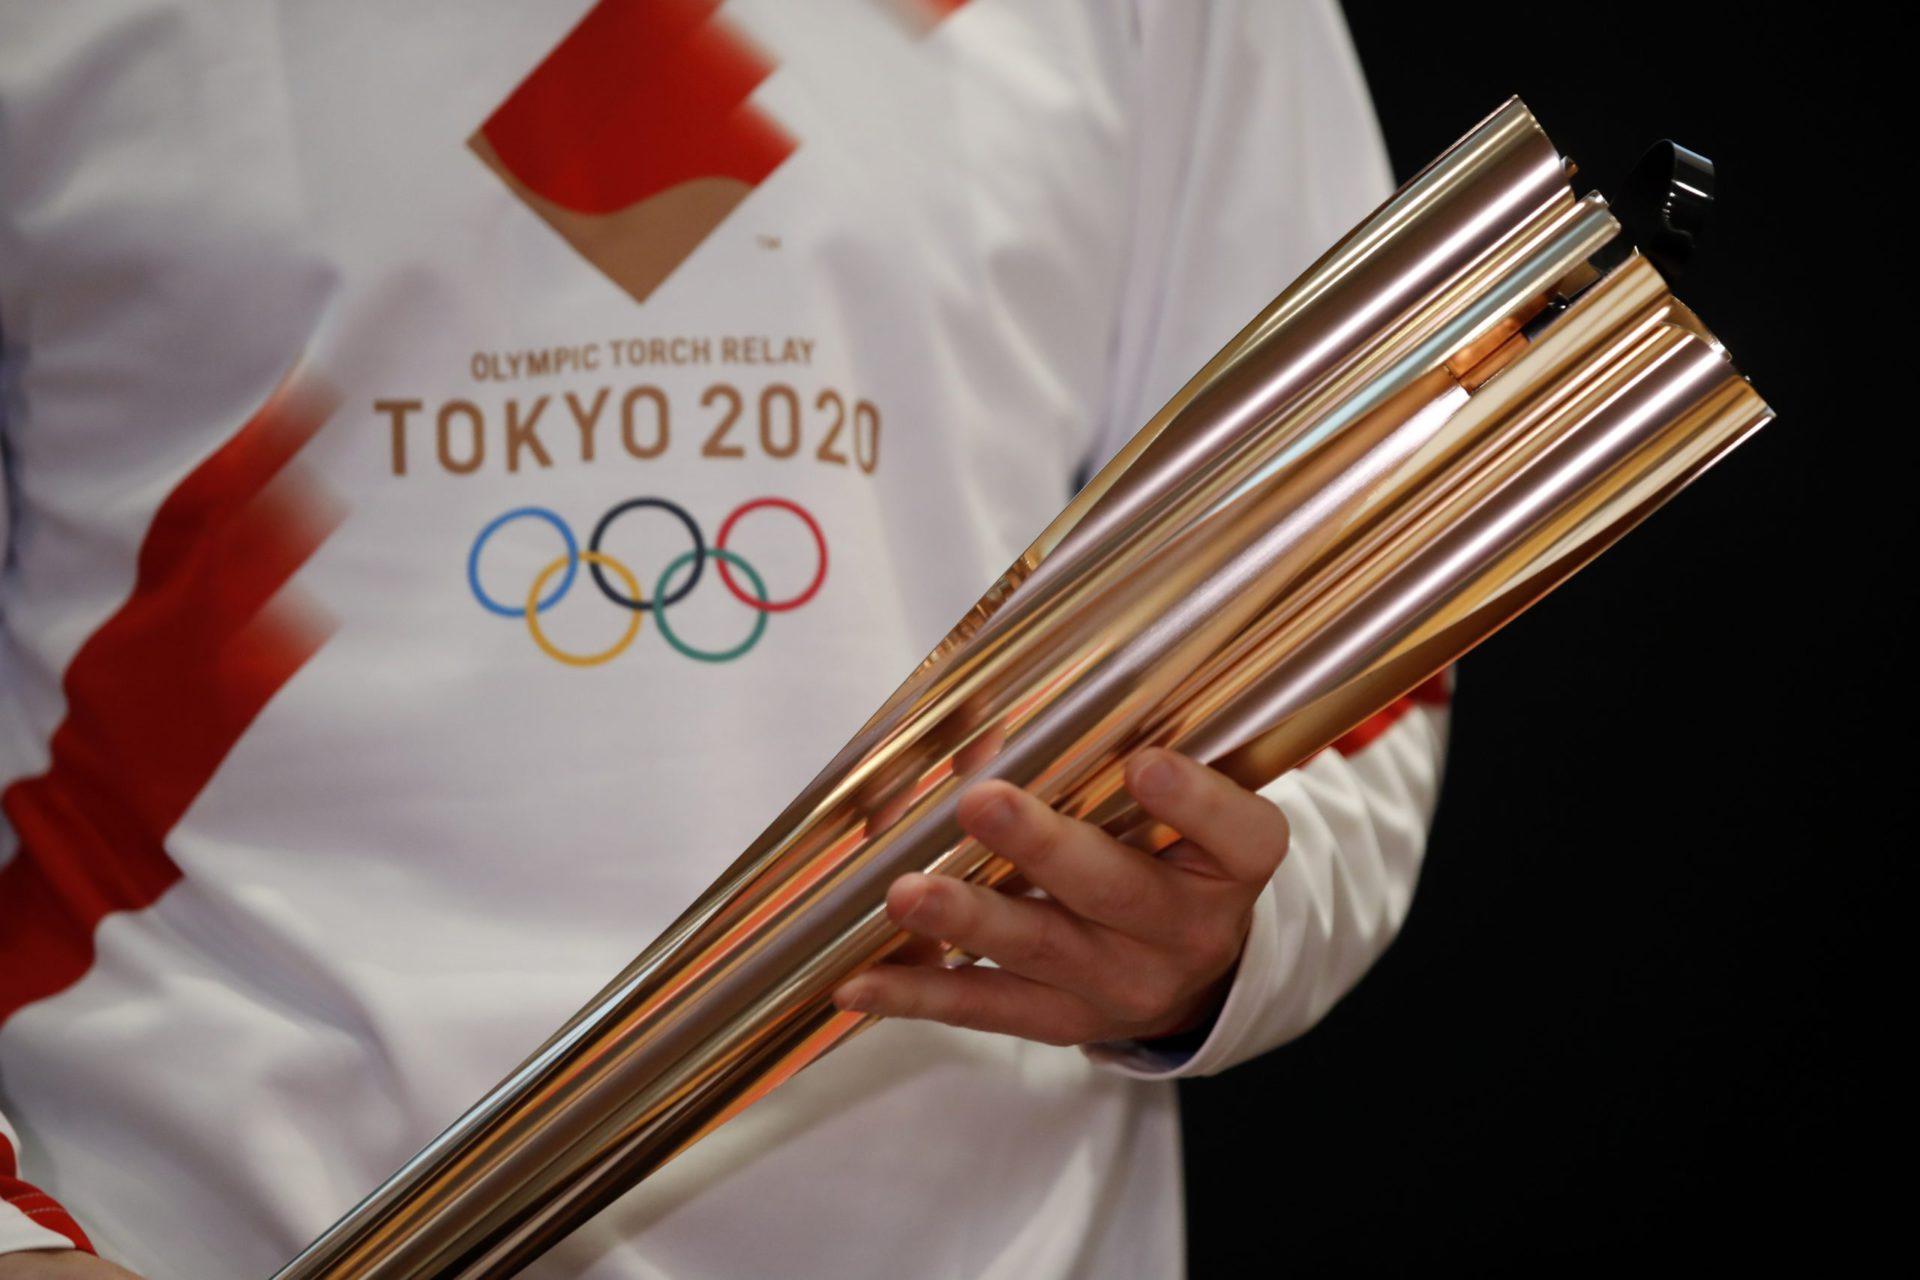 Tokyo Olympics: Coronavirus risk raises questions over 2021 Games photo